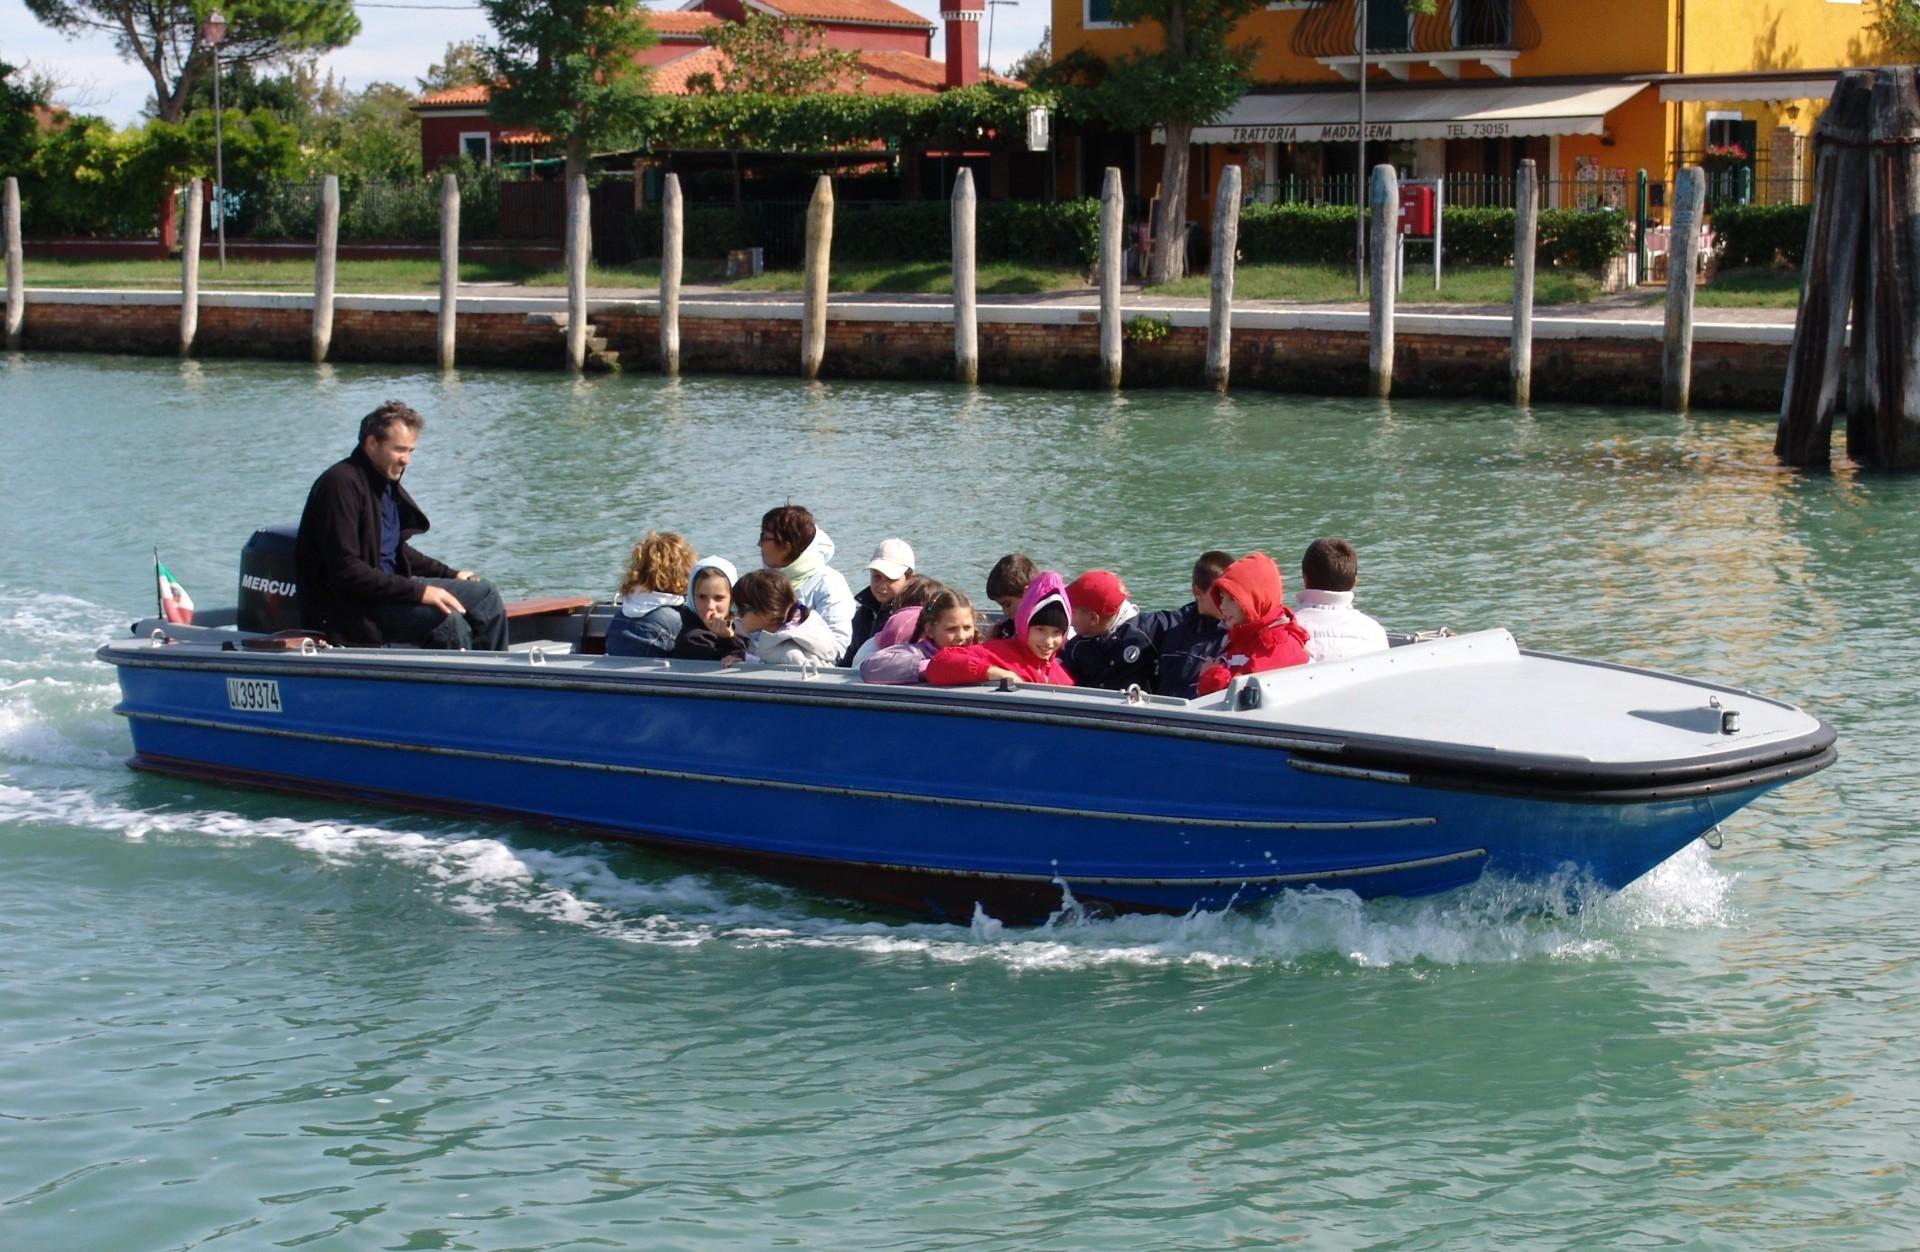 Bar-caro Lagunante - visita enogastronomica di Venezia